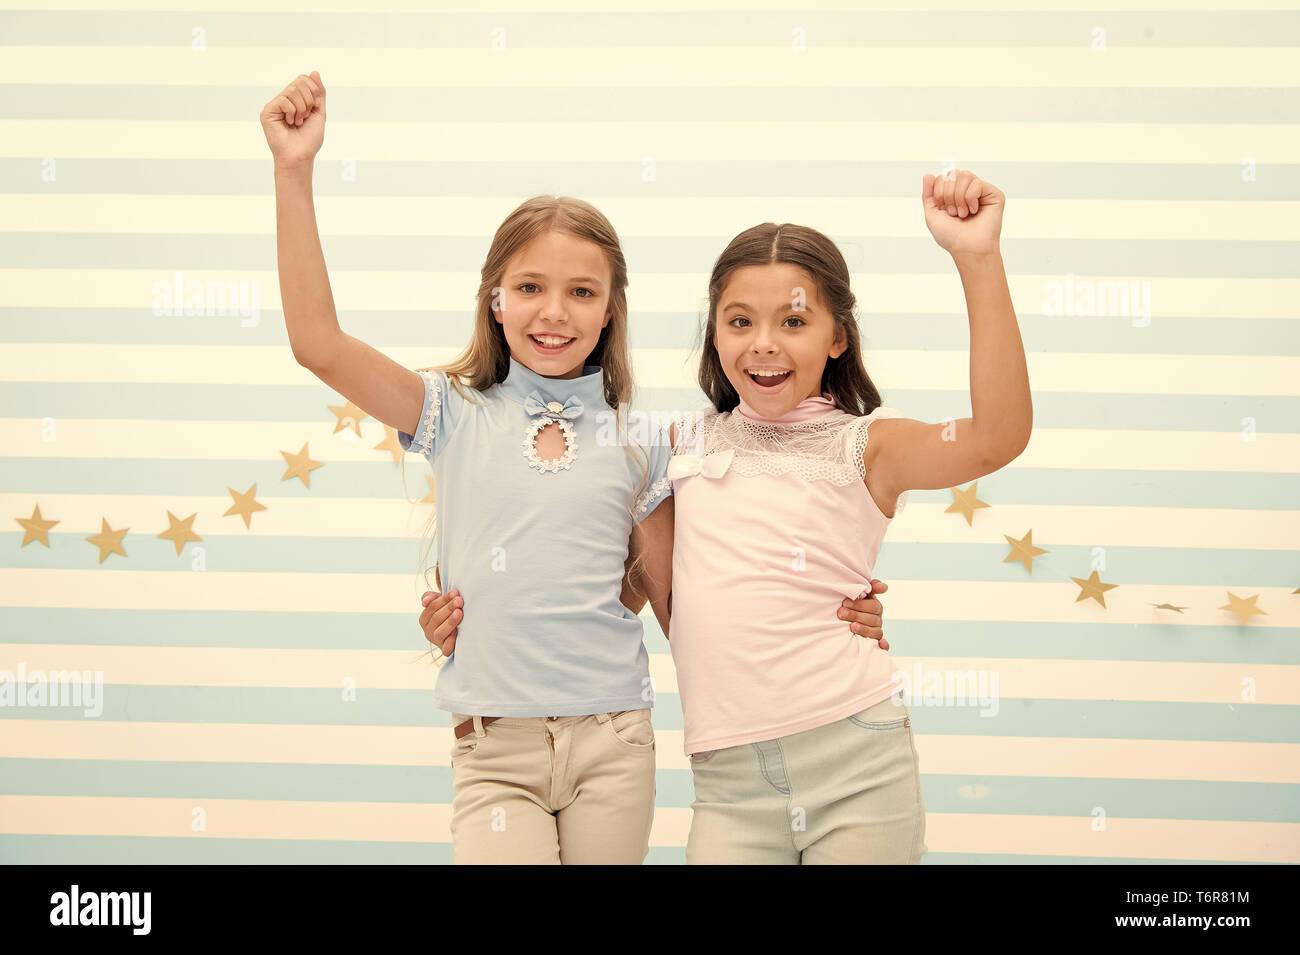 Best Friends Small Happy Girls Embrace As Best Friends Friendship Of Small Girls Meeting With The Best Friend Stock Photo Alamy